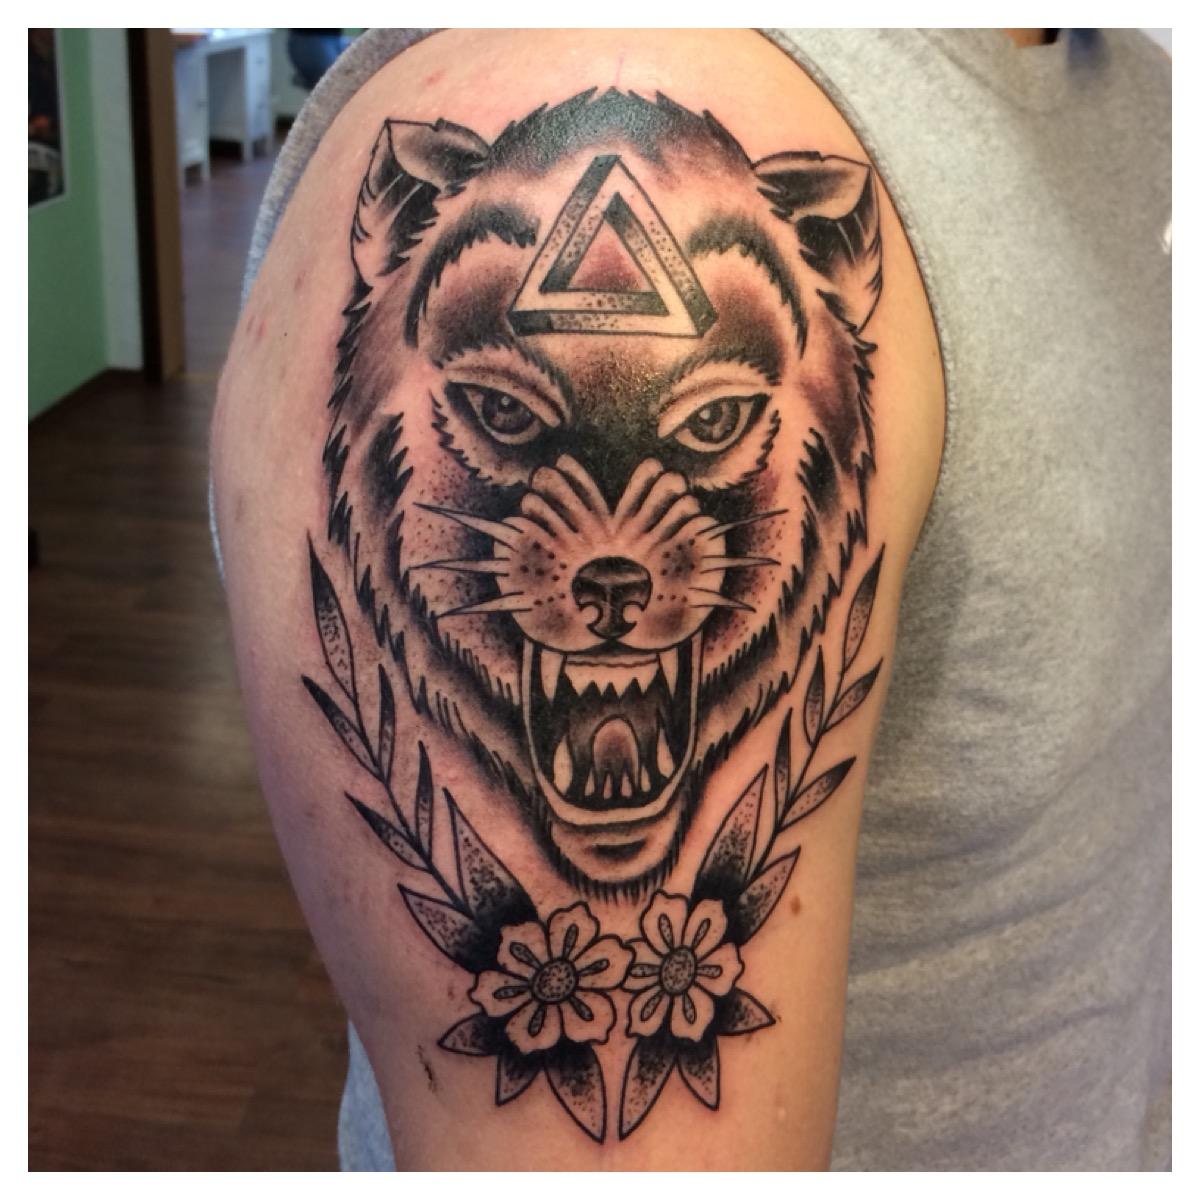 831_badwolf